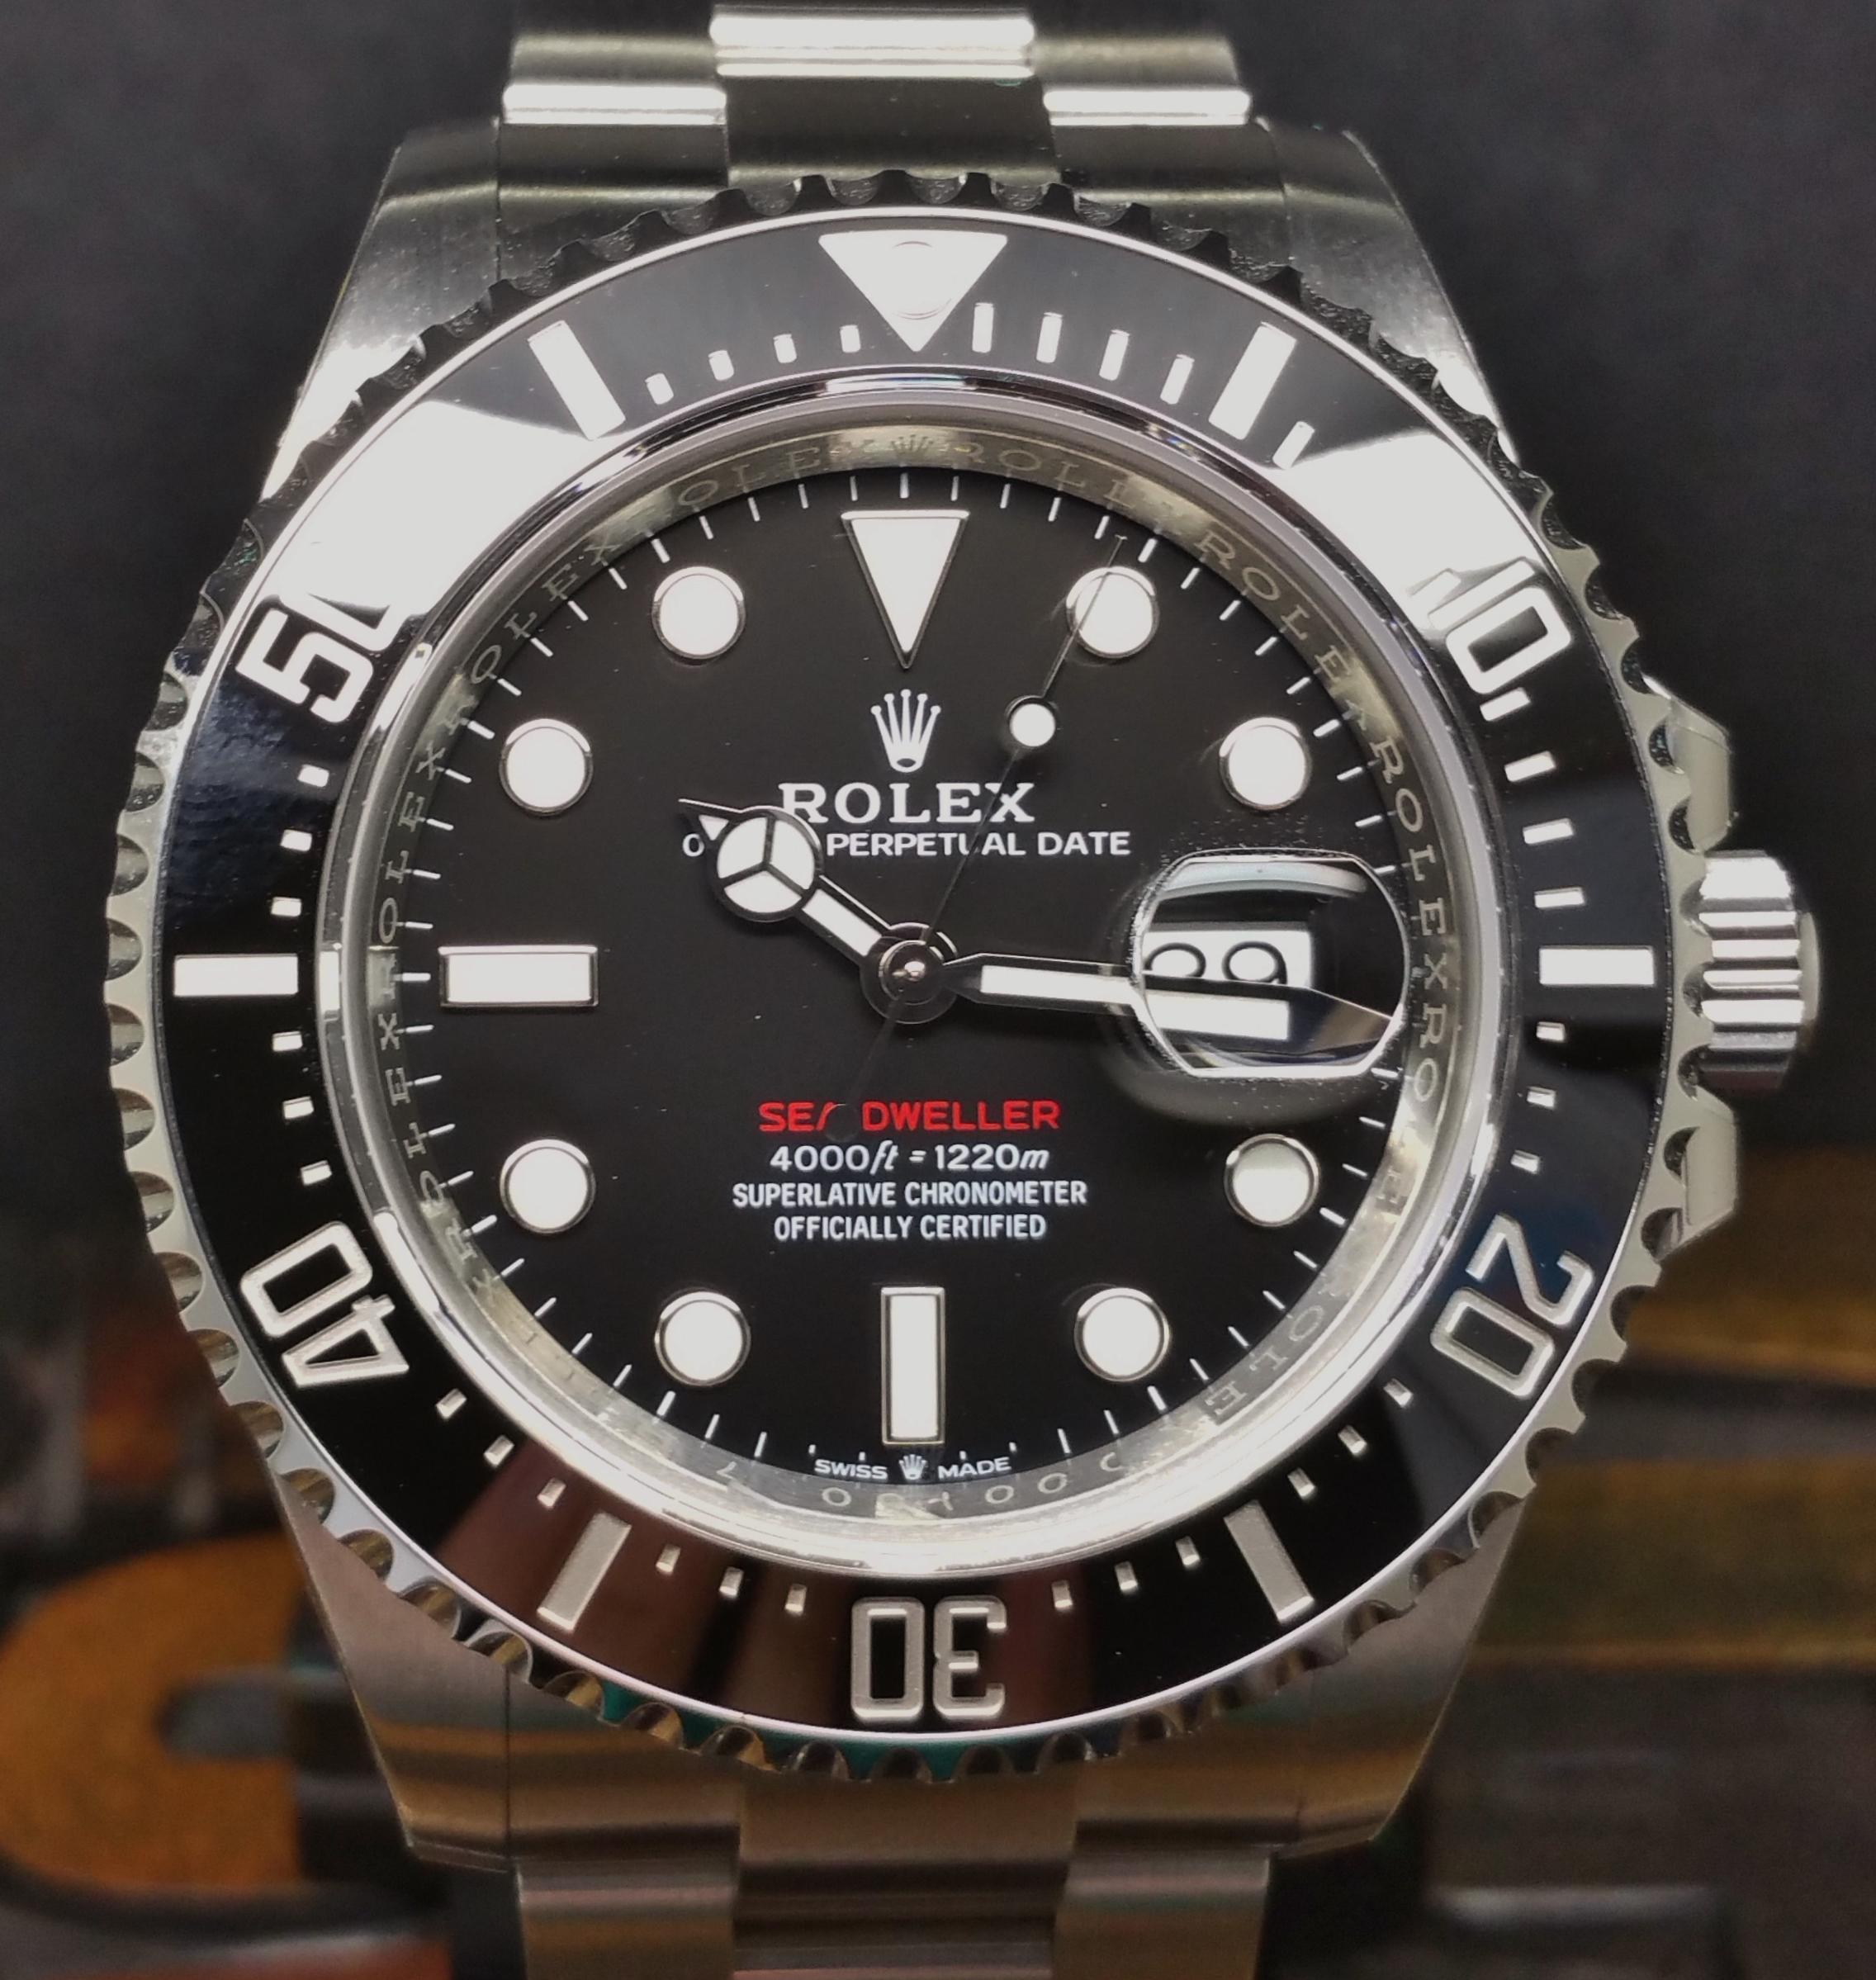 2018 Rolex Sea-Dweller Red 126600 50th Anniversary NEW